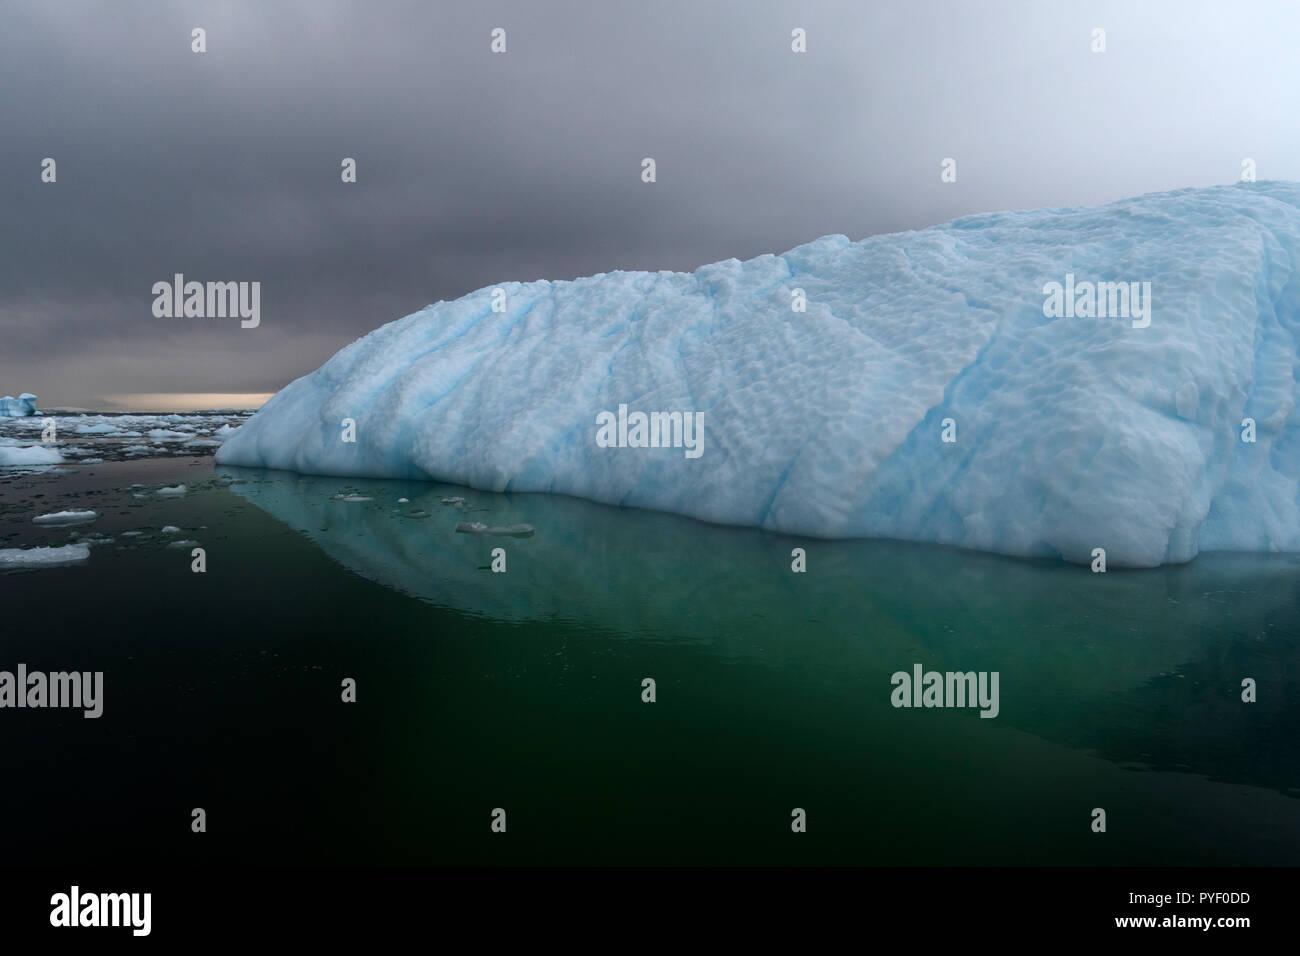 blue ice berg reflected in still water antarctic peninsula antarctica - Stock Image